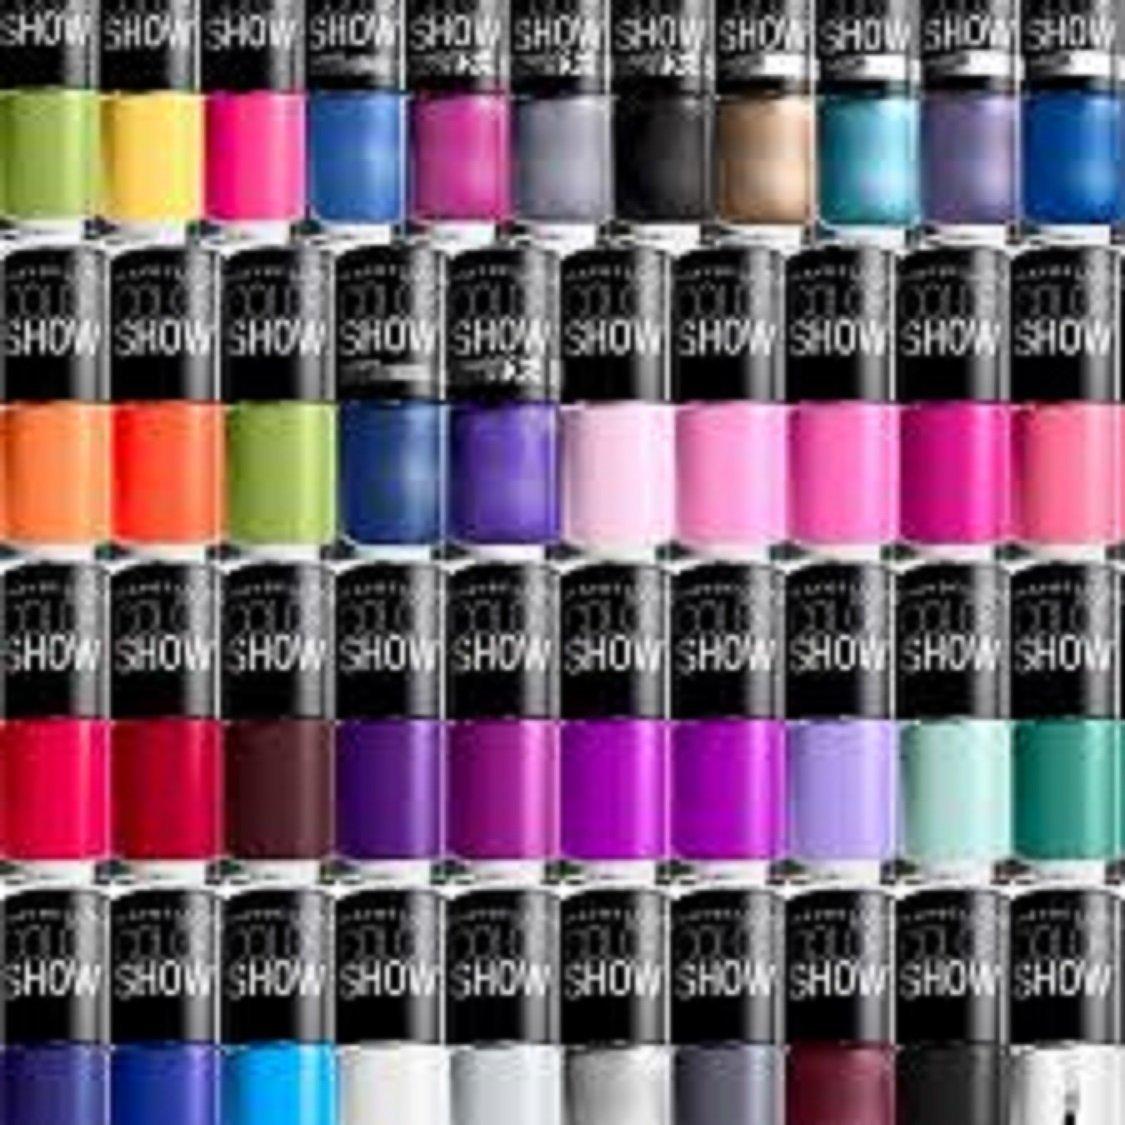 Amazon.com: Maybelline Color Show Finger Nail Polish Random 12 Piece ...